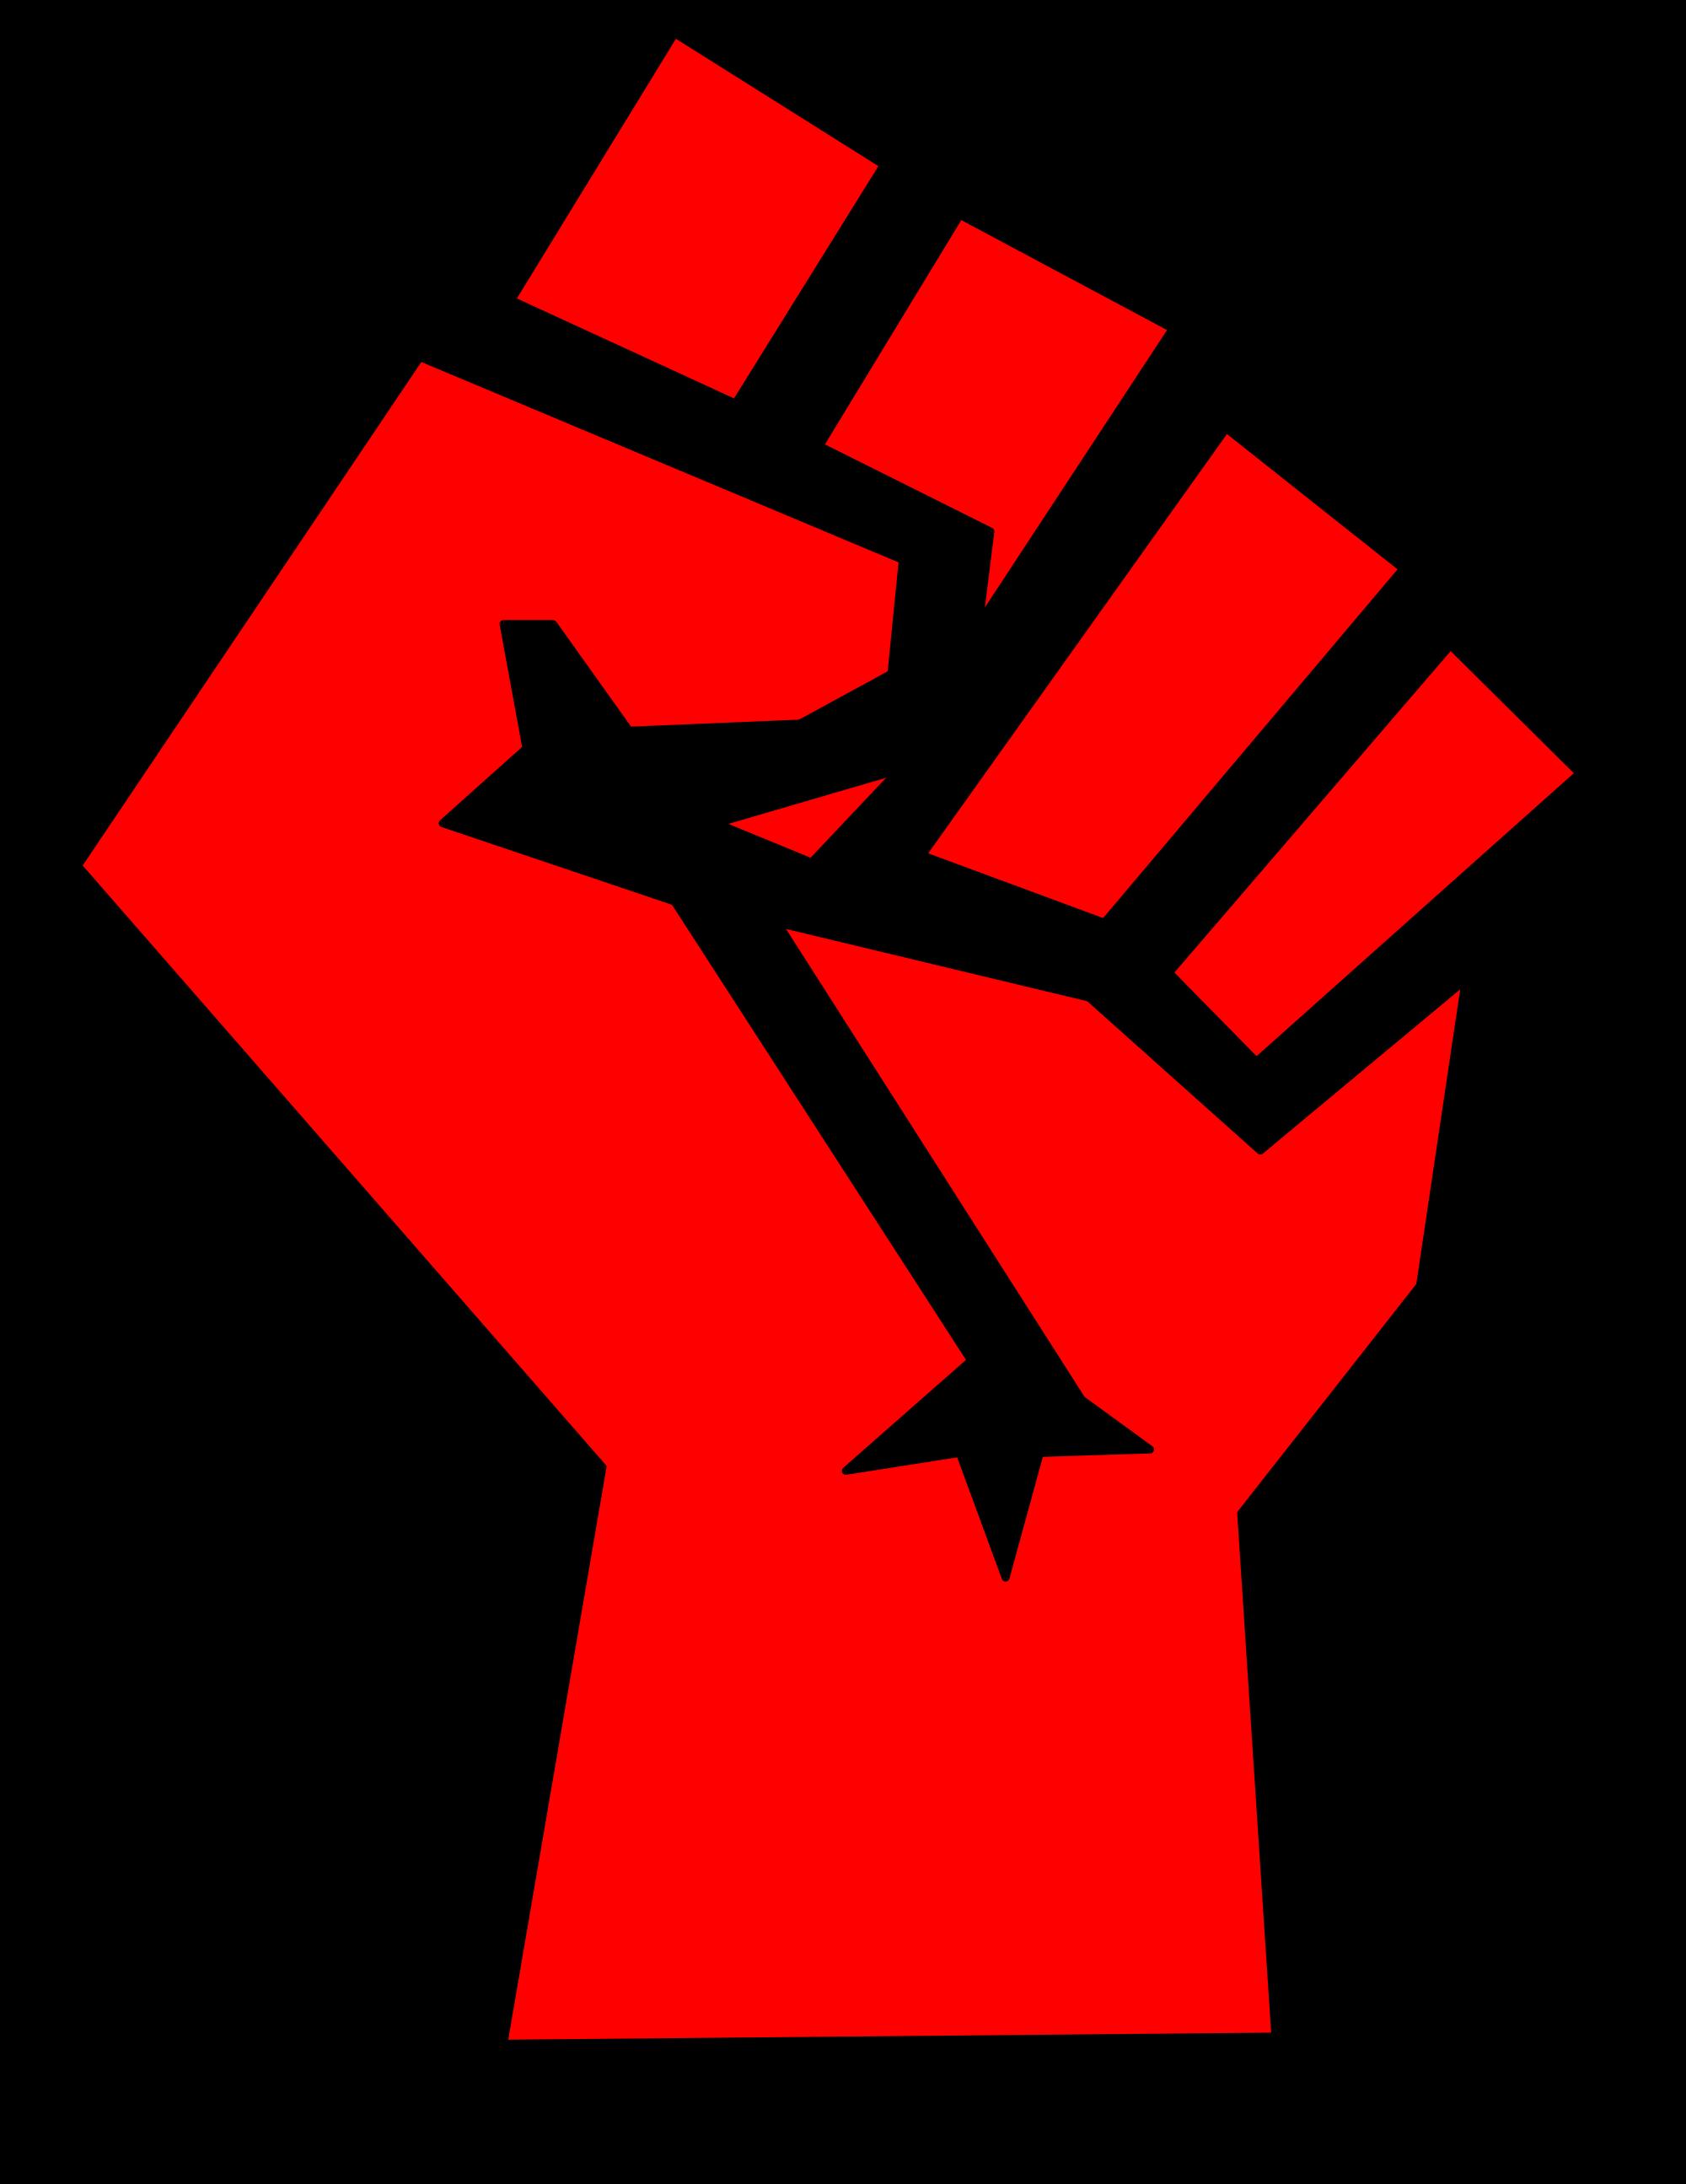 Image Socialist Thingy Lelelelleeeeeeg Thefutureofeuropes